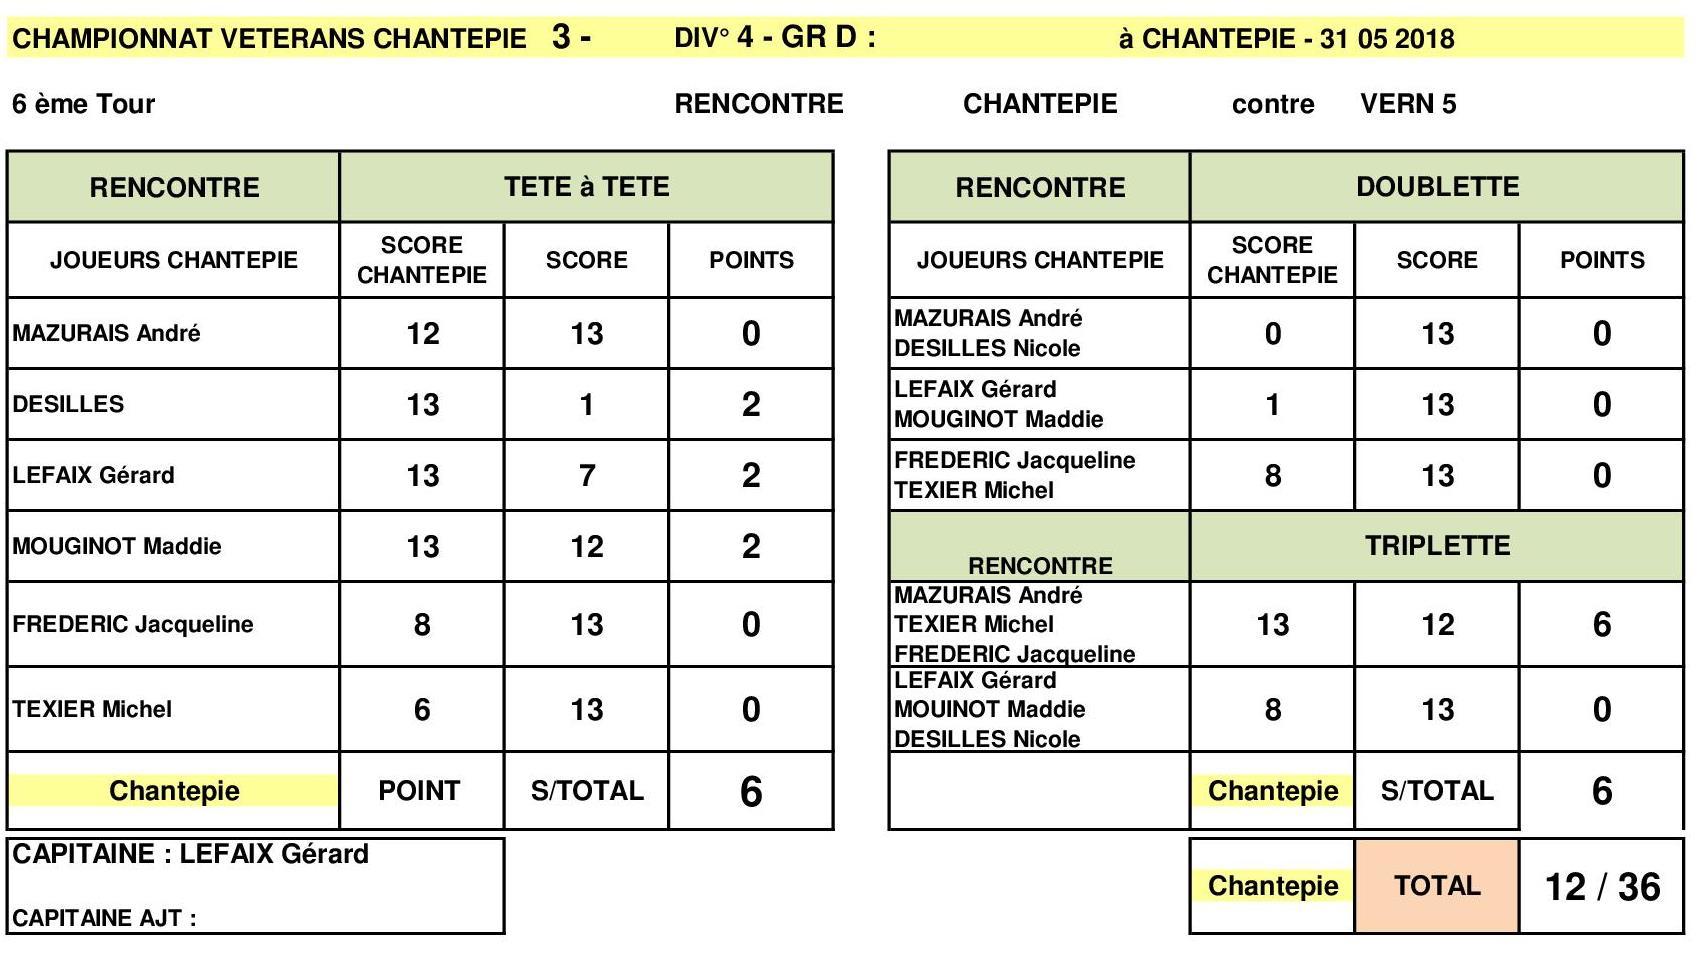 RESULTAT CDC 31 MAI 2018 CHANTEPIE3 contre VERN 5.jpg